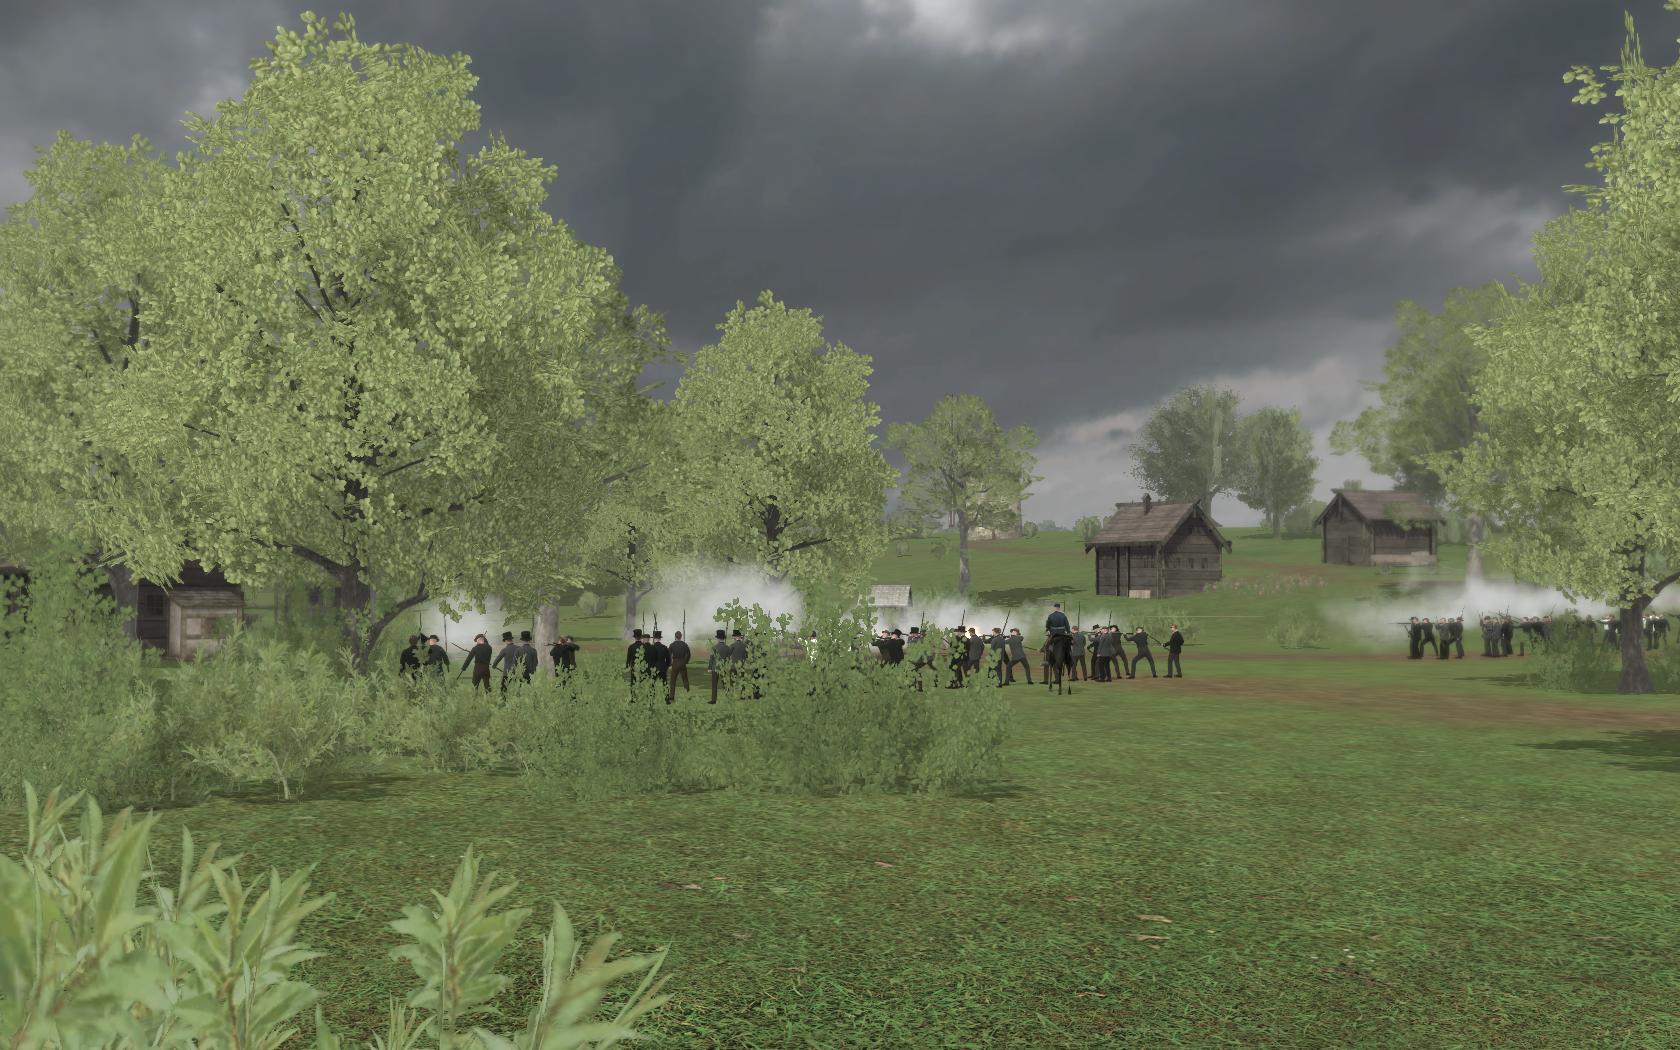 Rebels in a village